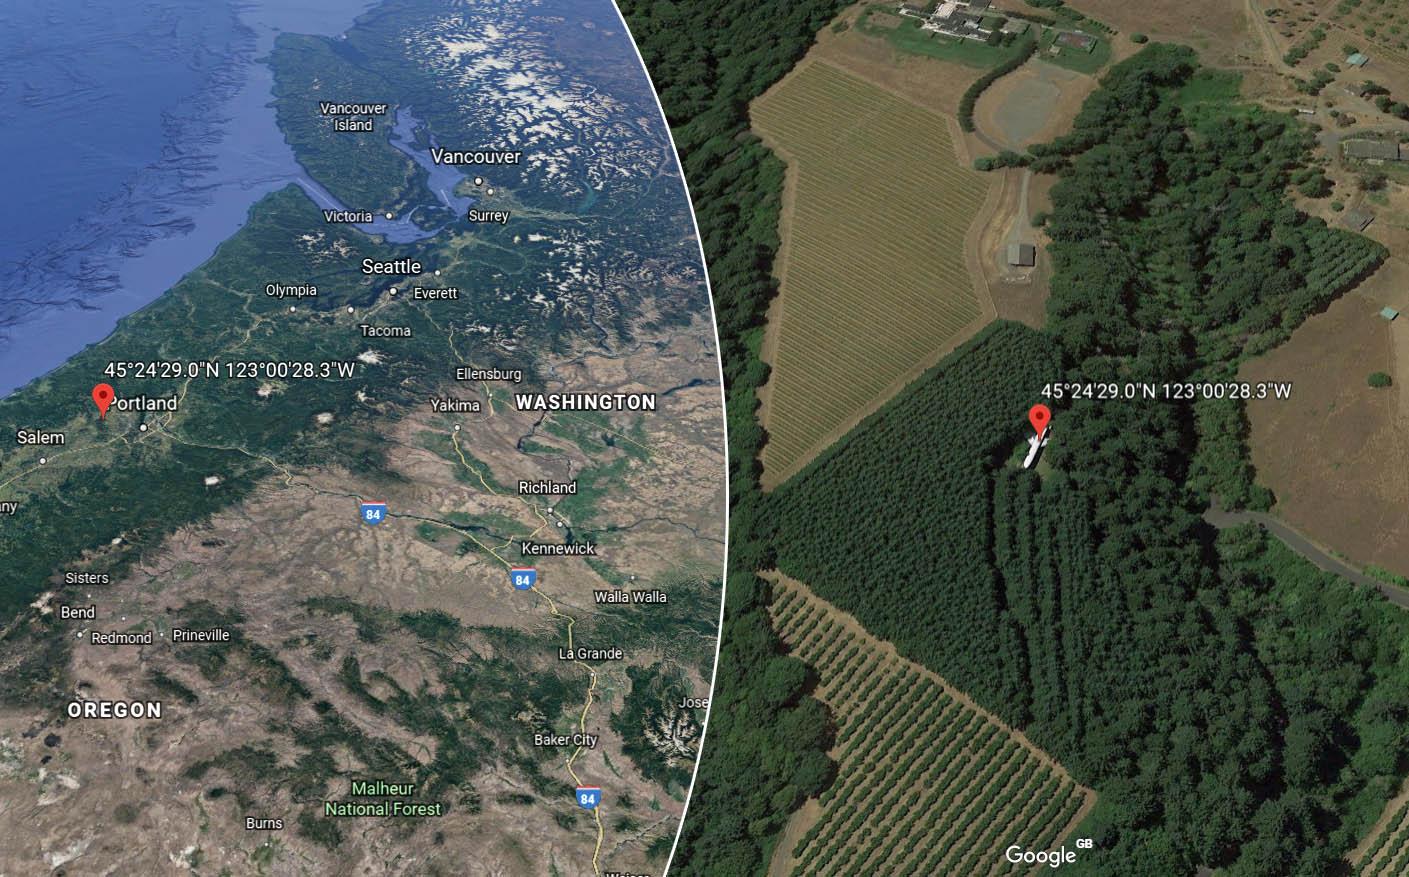 The Plane Is Seen Near Oregon, USA on Google Earth. Credit: Google Earth